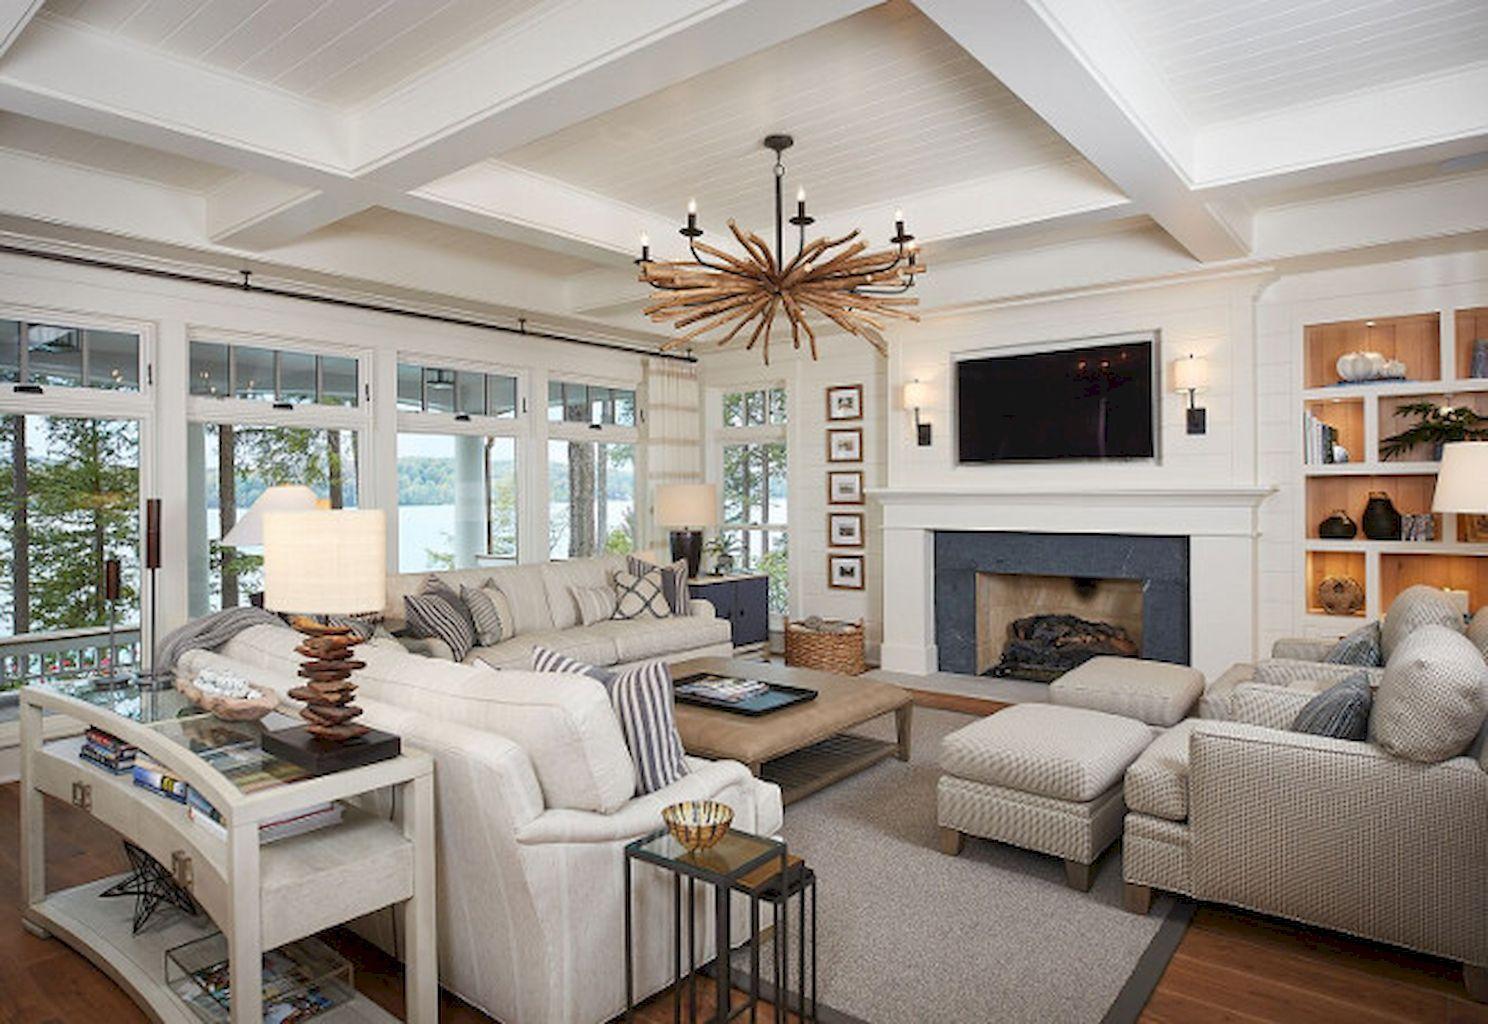 99 Cozy And Stylish Coastal Living Room Decor Ideas  Coastal Glamorous Coastal Living Room Designs Inspiration Design